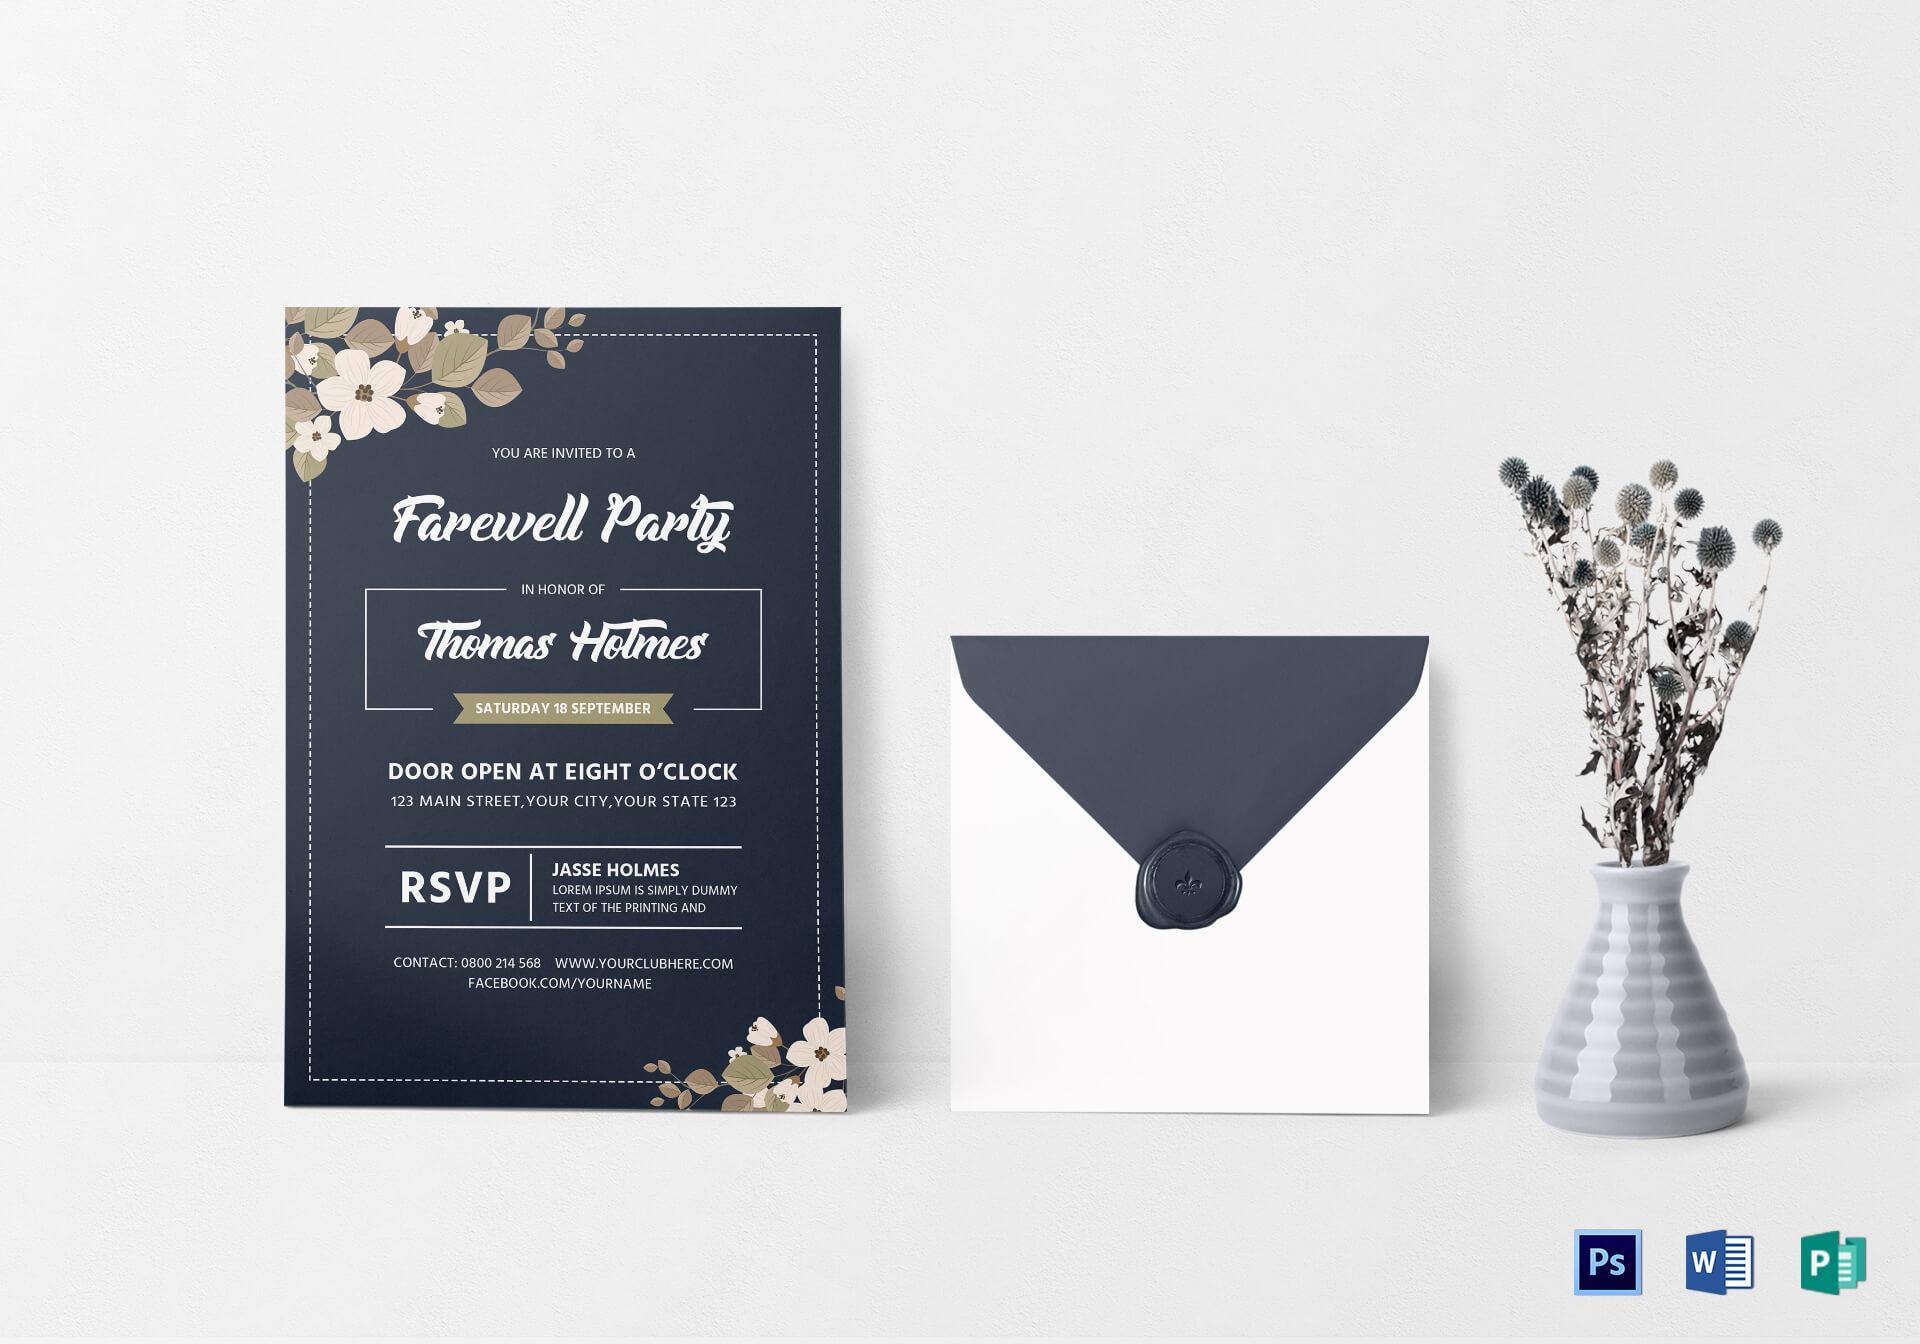 Farewell Party Invitation Card Template Regarding Farewell Card Template Word